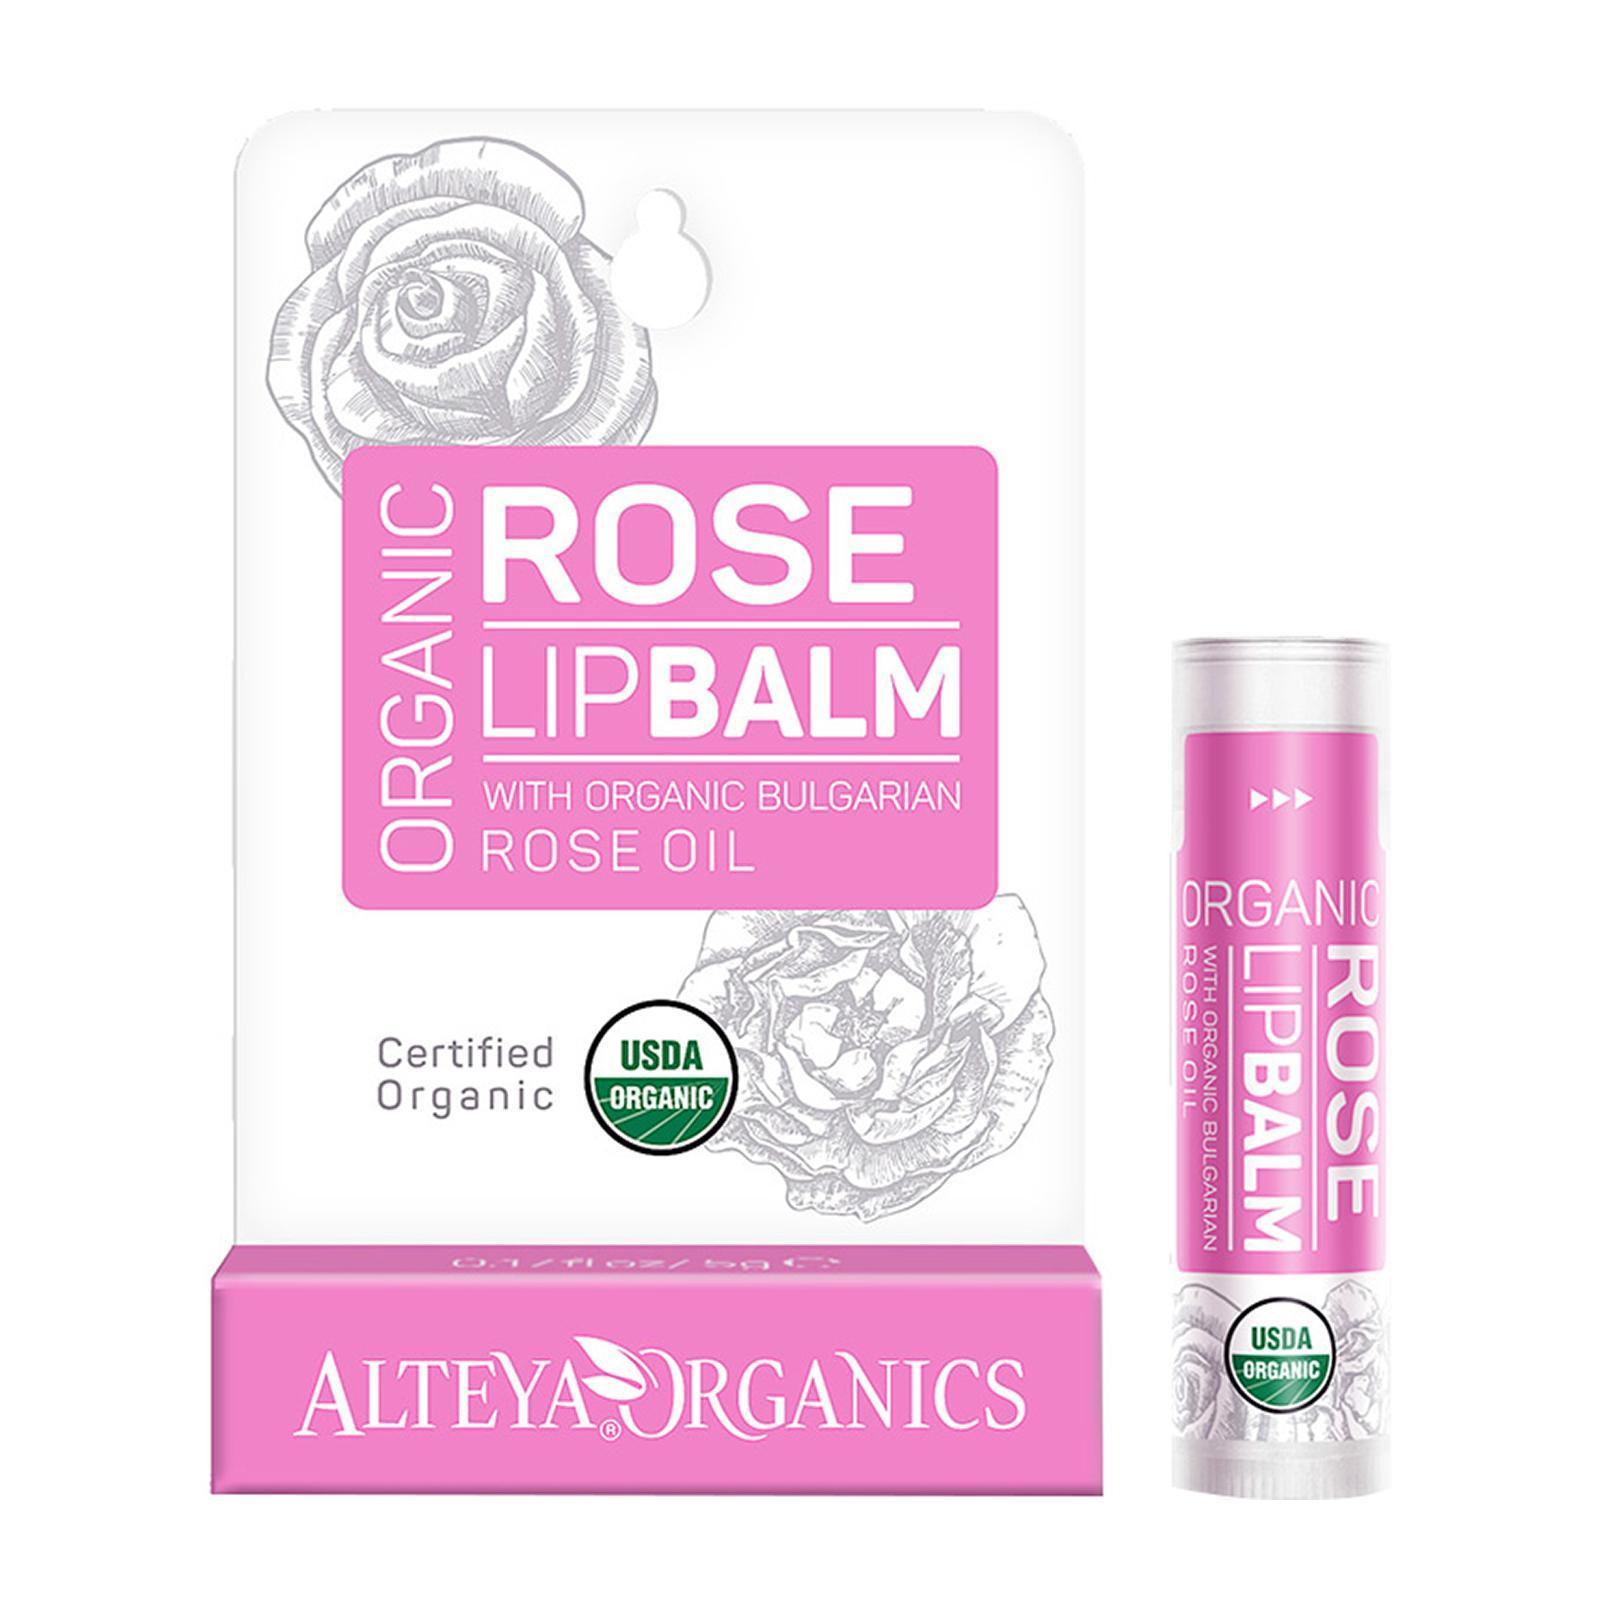 Alteya Organics Organic Rose Lip Balm